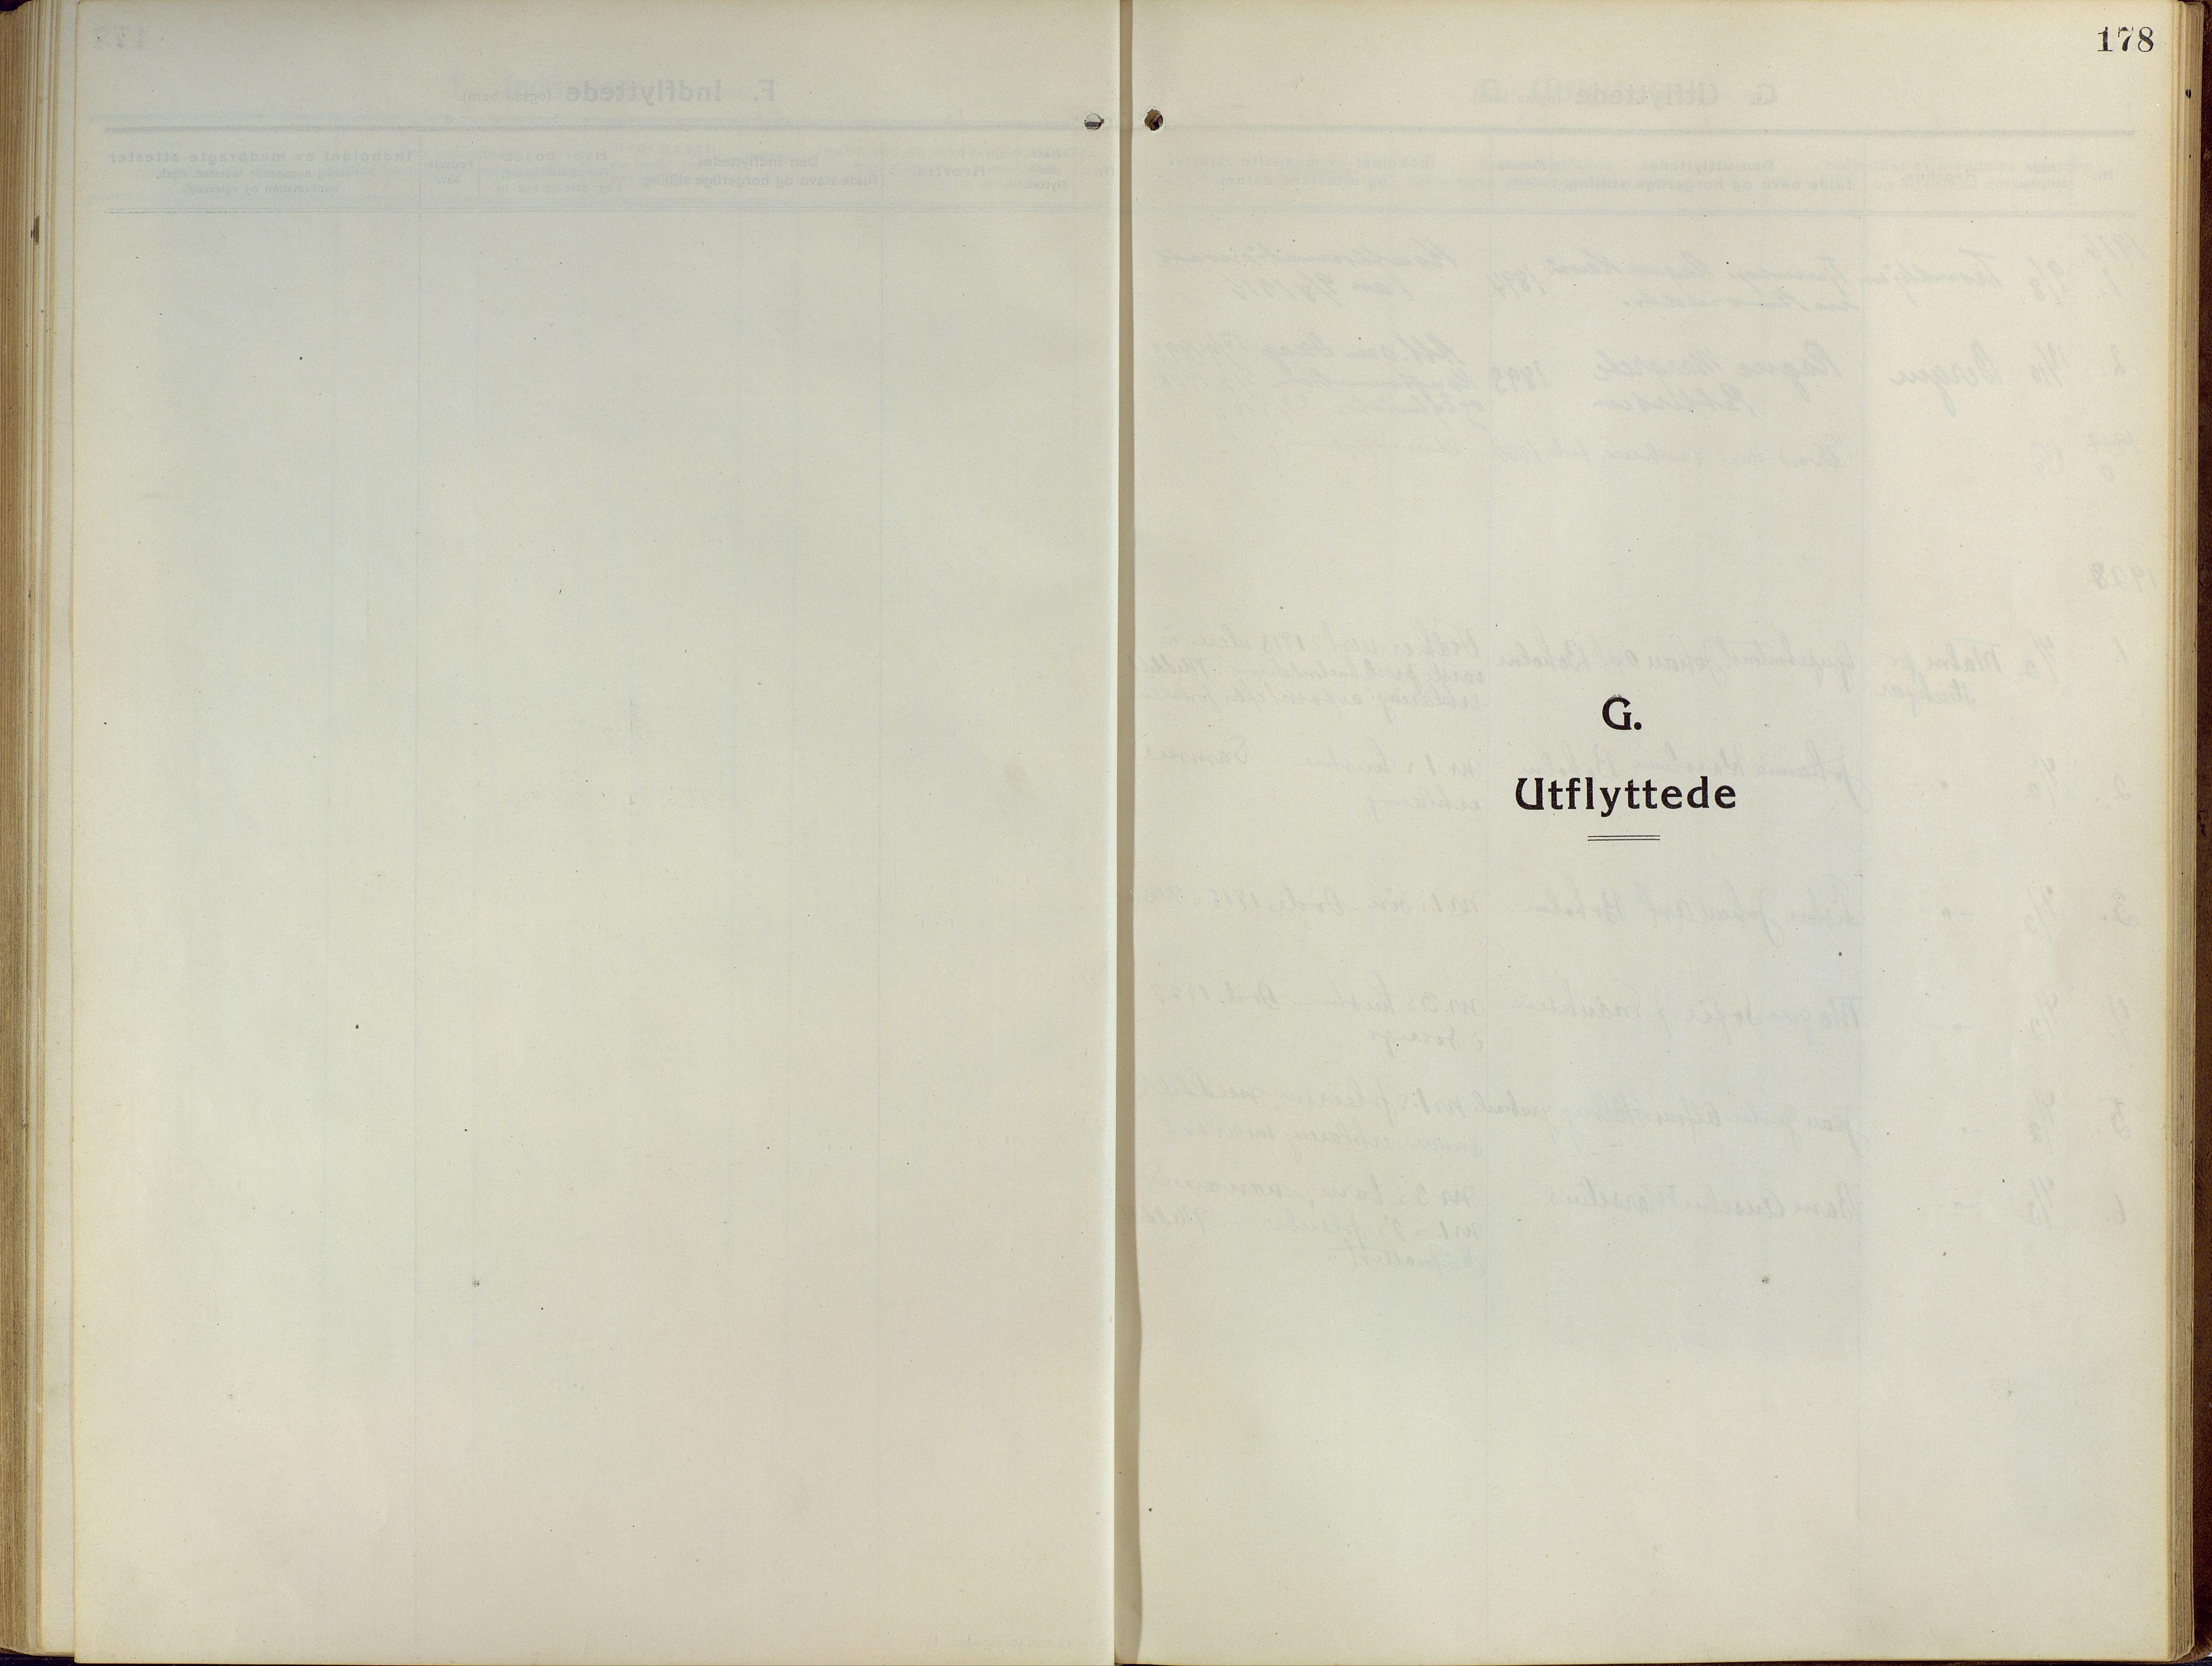 SATØ, Sand/Bjarkøy sokneprestkontor, I/Ia/Iaa/L0006kirke: Ministerialbok nr. 6, 1915-1929, s. 178